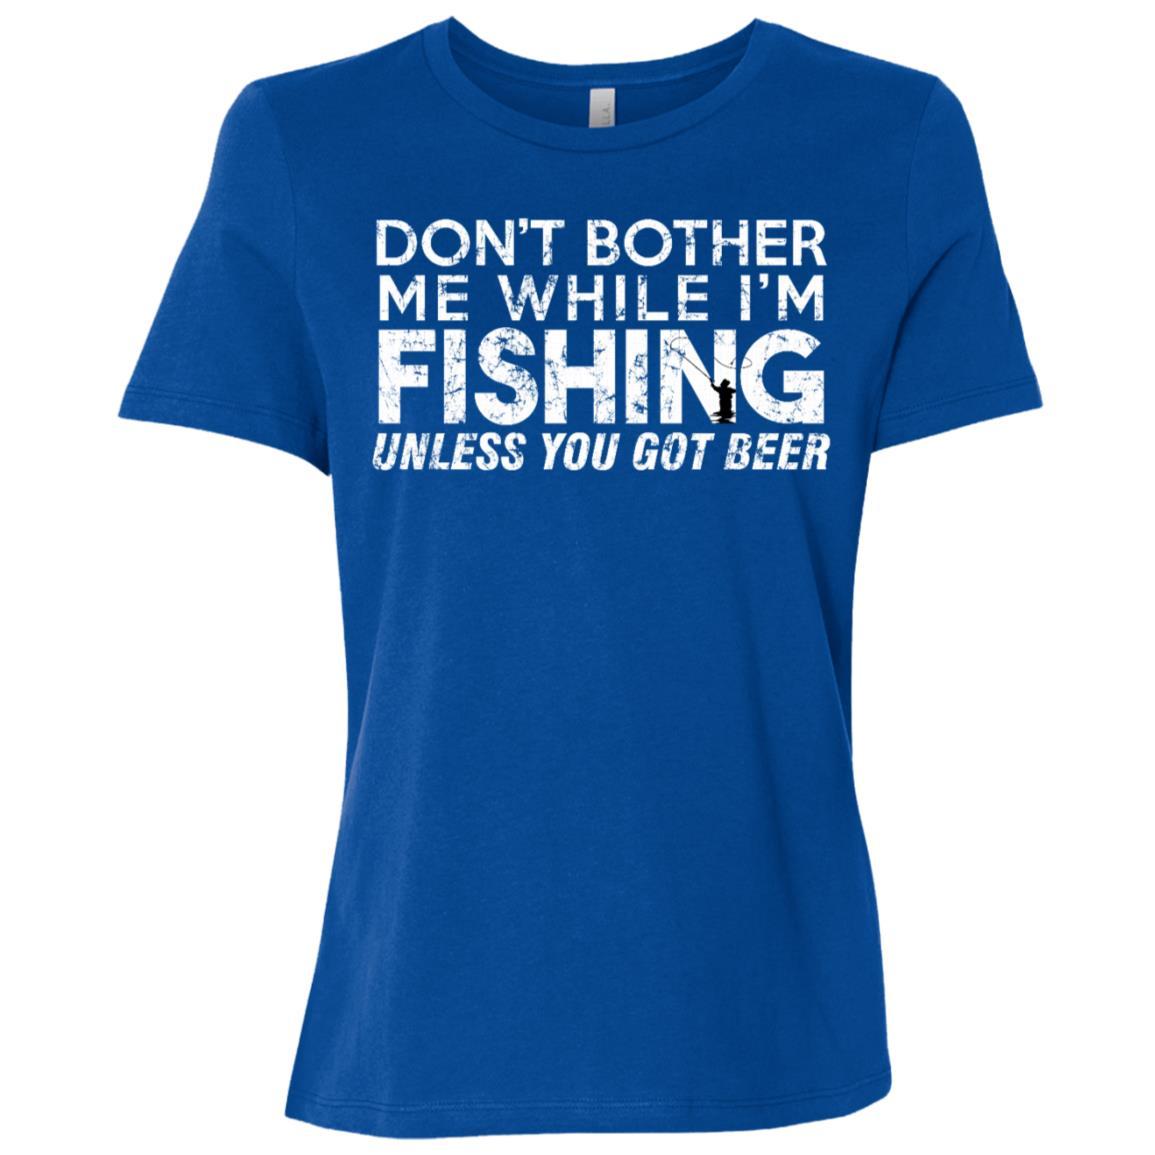 Fishing Funny Sarcasm Quotes Joke Hobbies Humor Women Short Sleeve T-Shirt